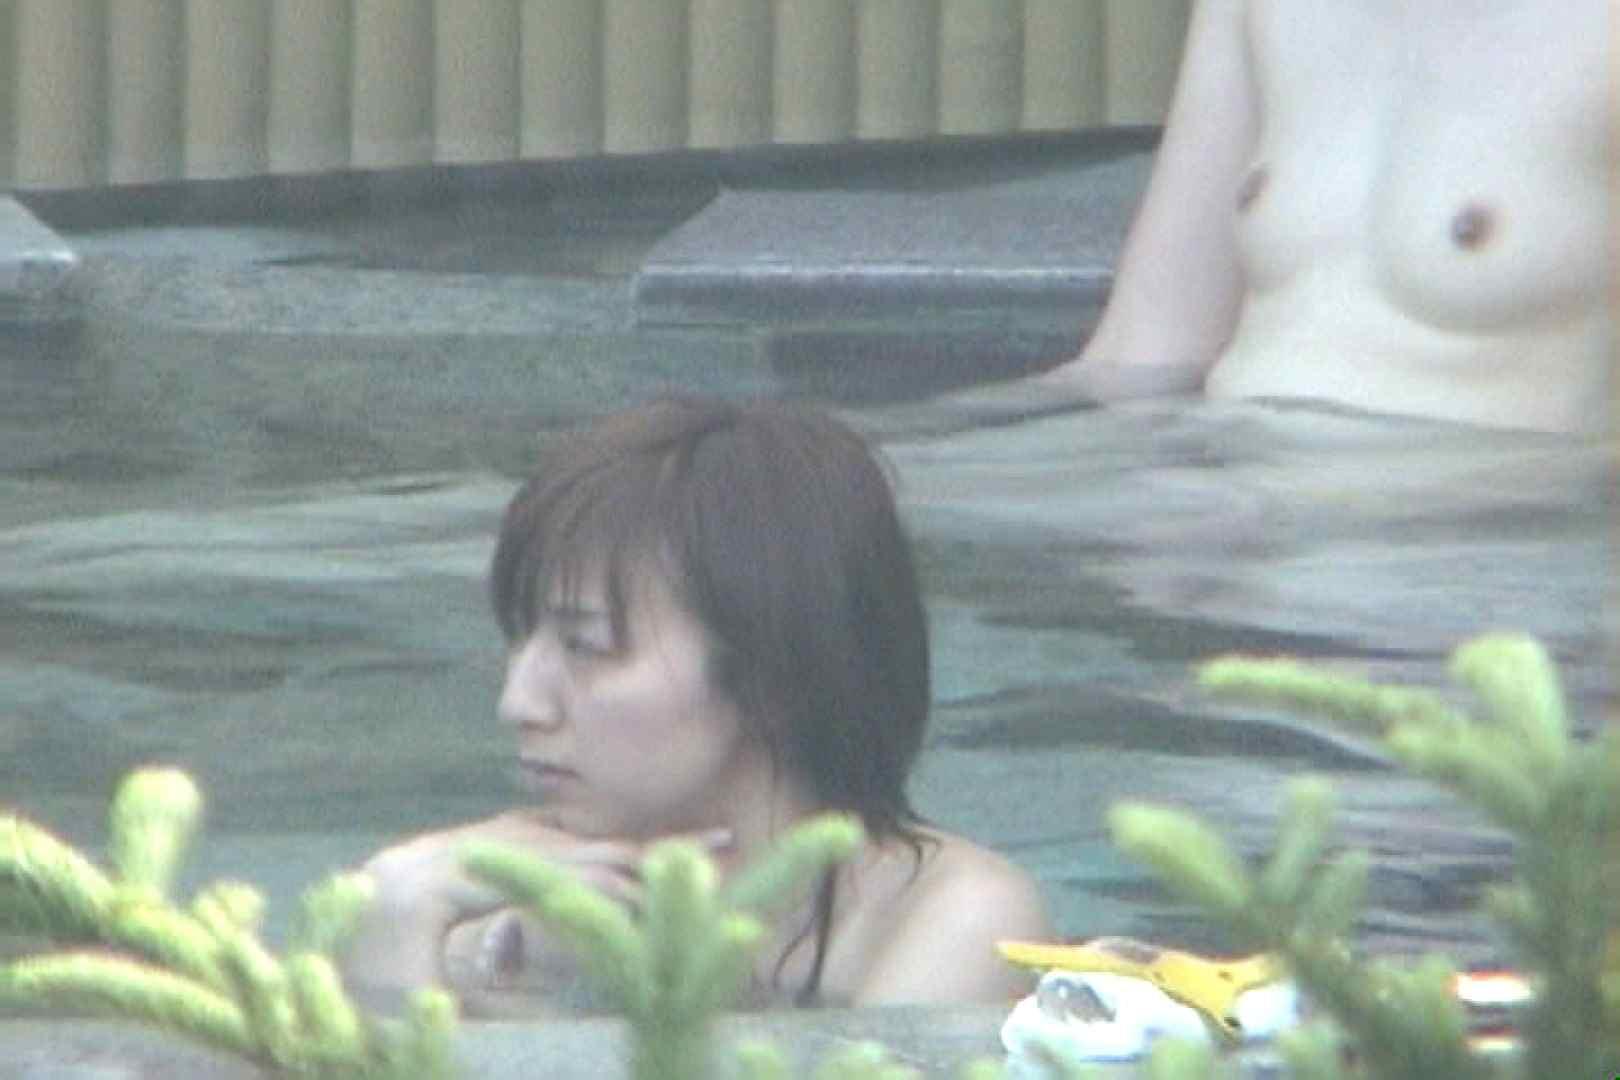 Aquaな露天風呂Vol.77【VIP限定】 盗撮   OLセックス  107画像 19